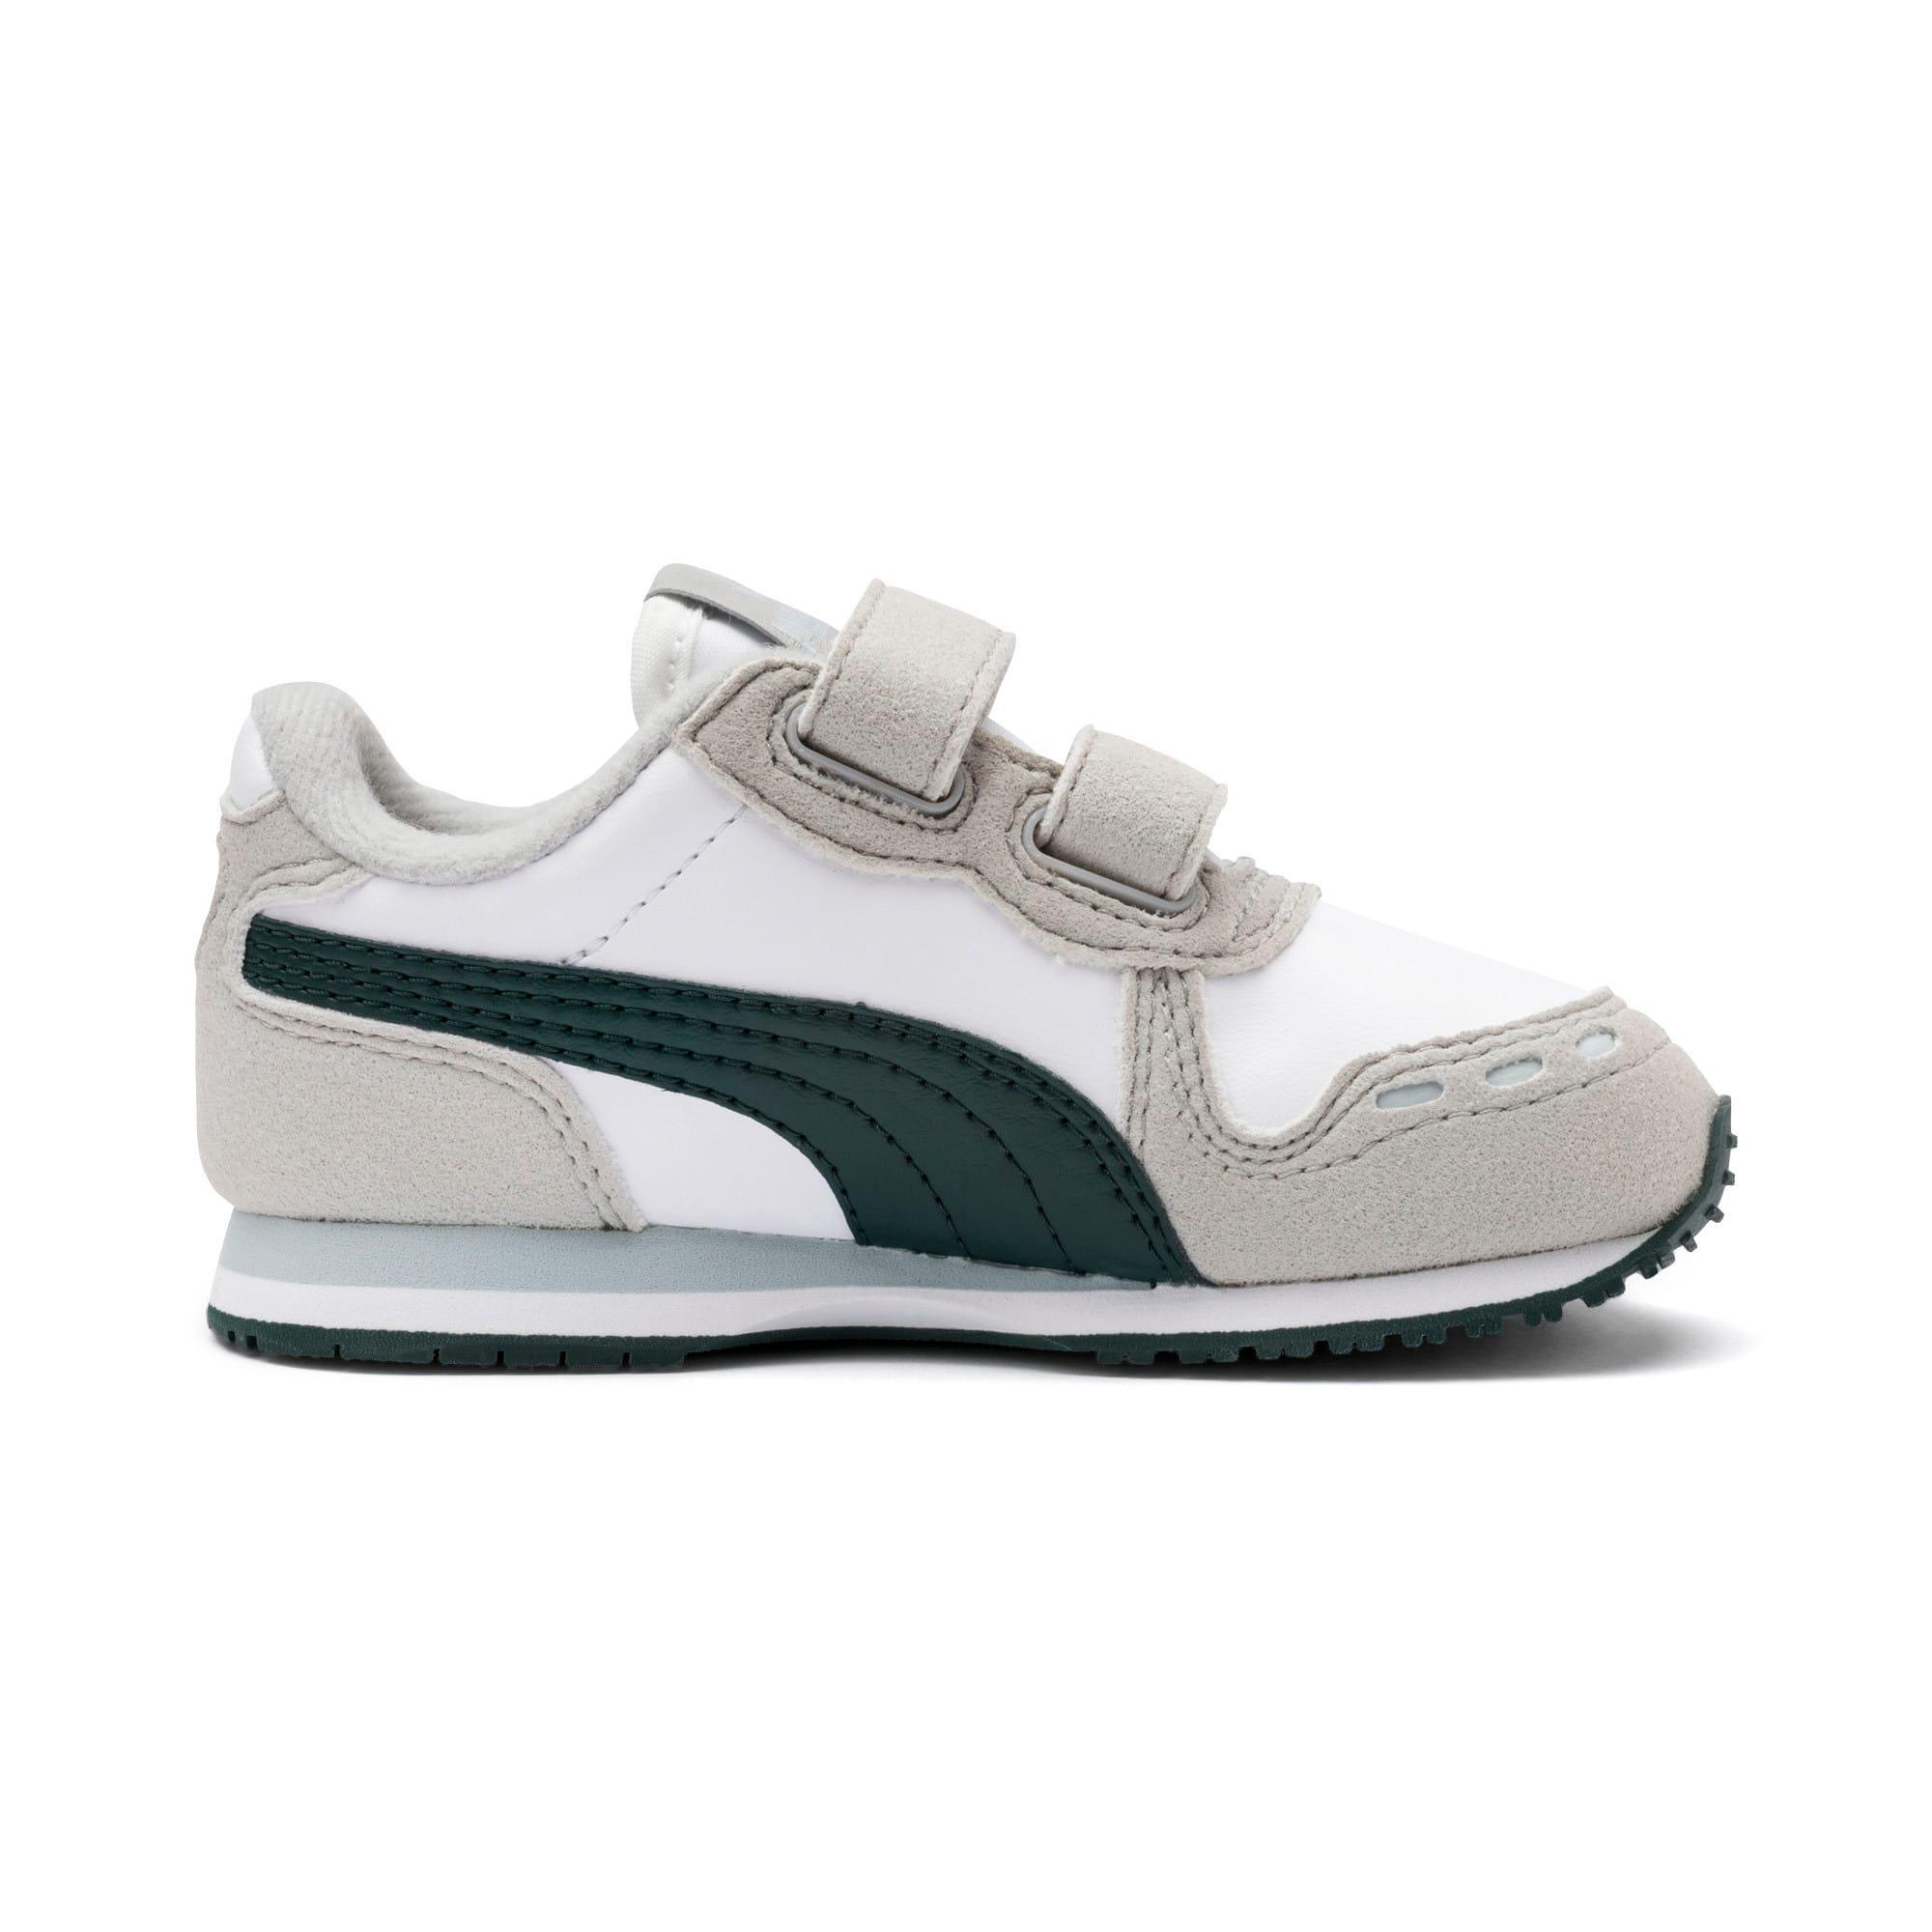 Thumbnail 5 of Cabana Racer SL AC Little Kids' Shoes, P.Wht-Gr.Violet-Ponder. Pine, medium